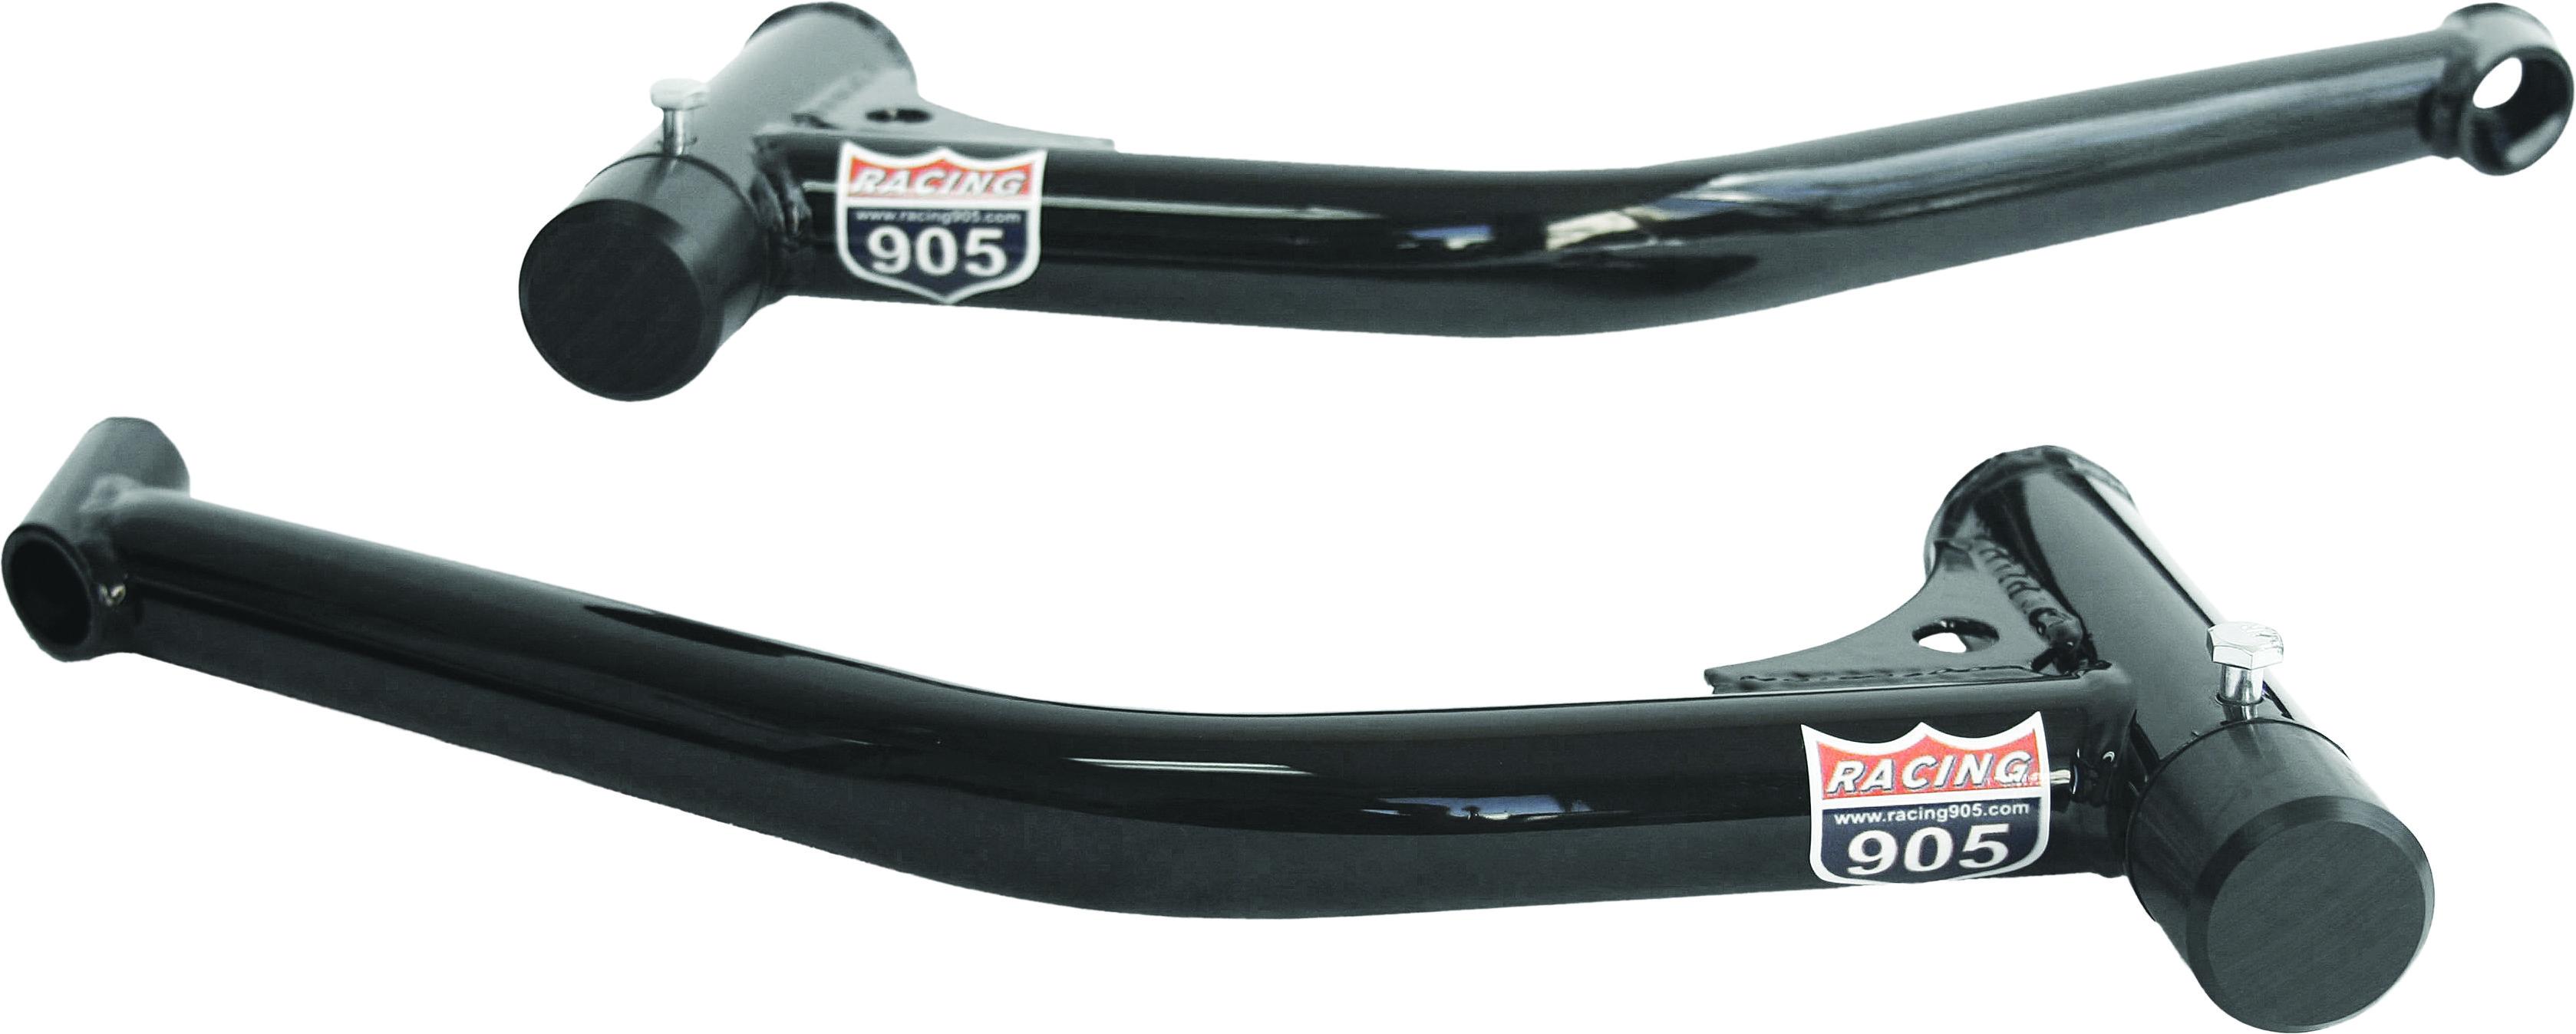 Racing 905 16-ZX6R-RA Race Armor